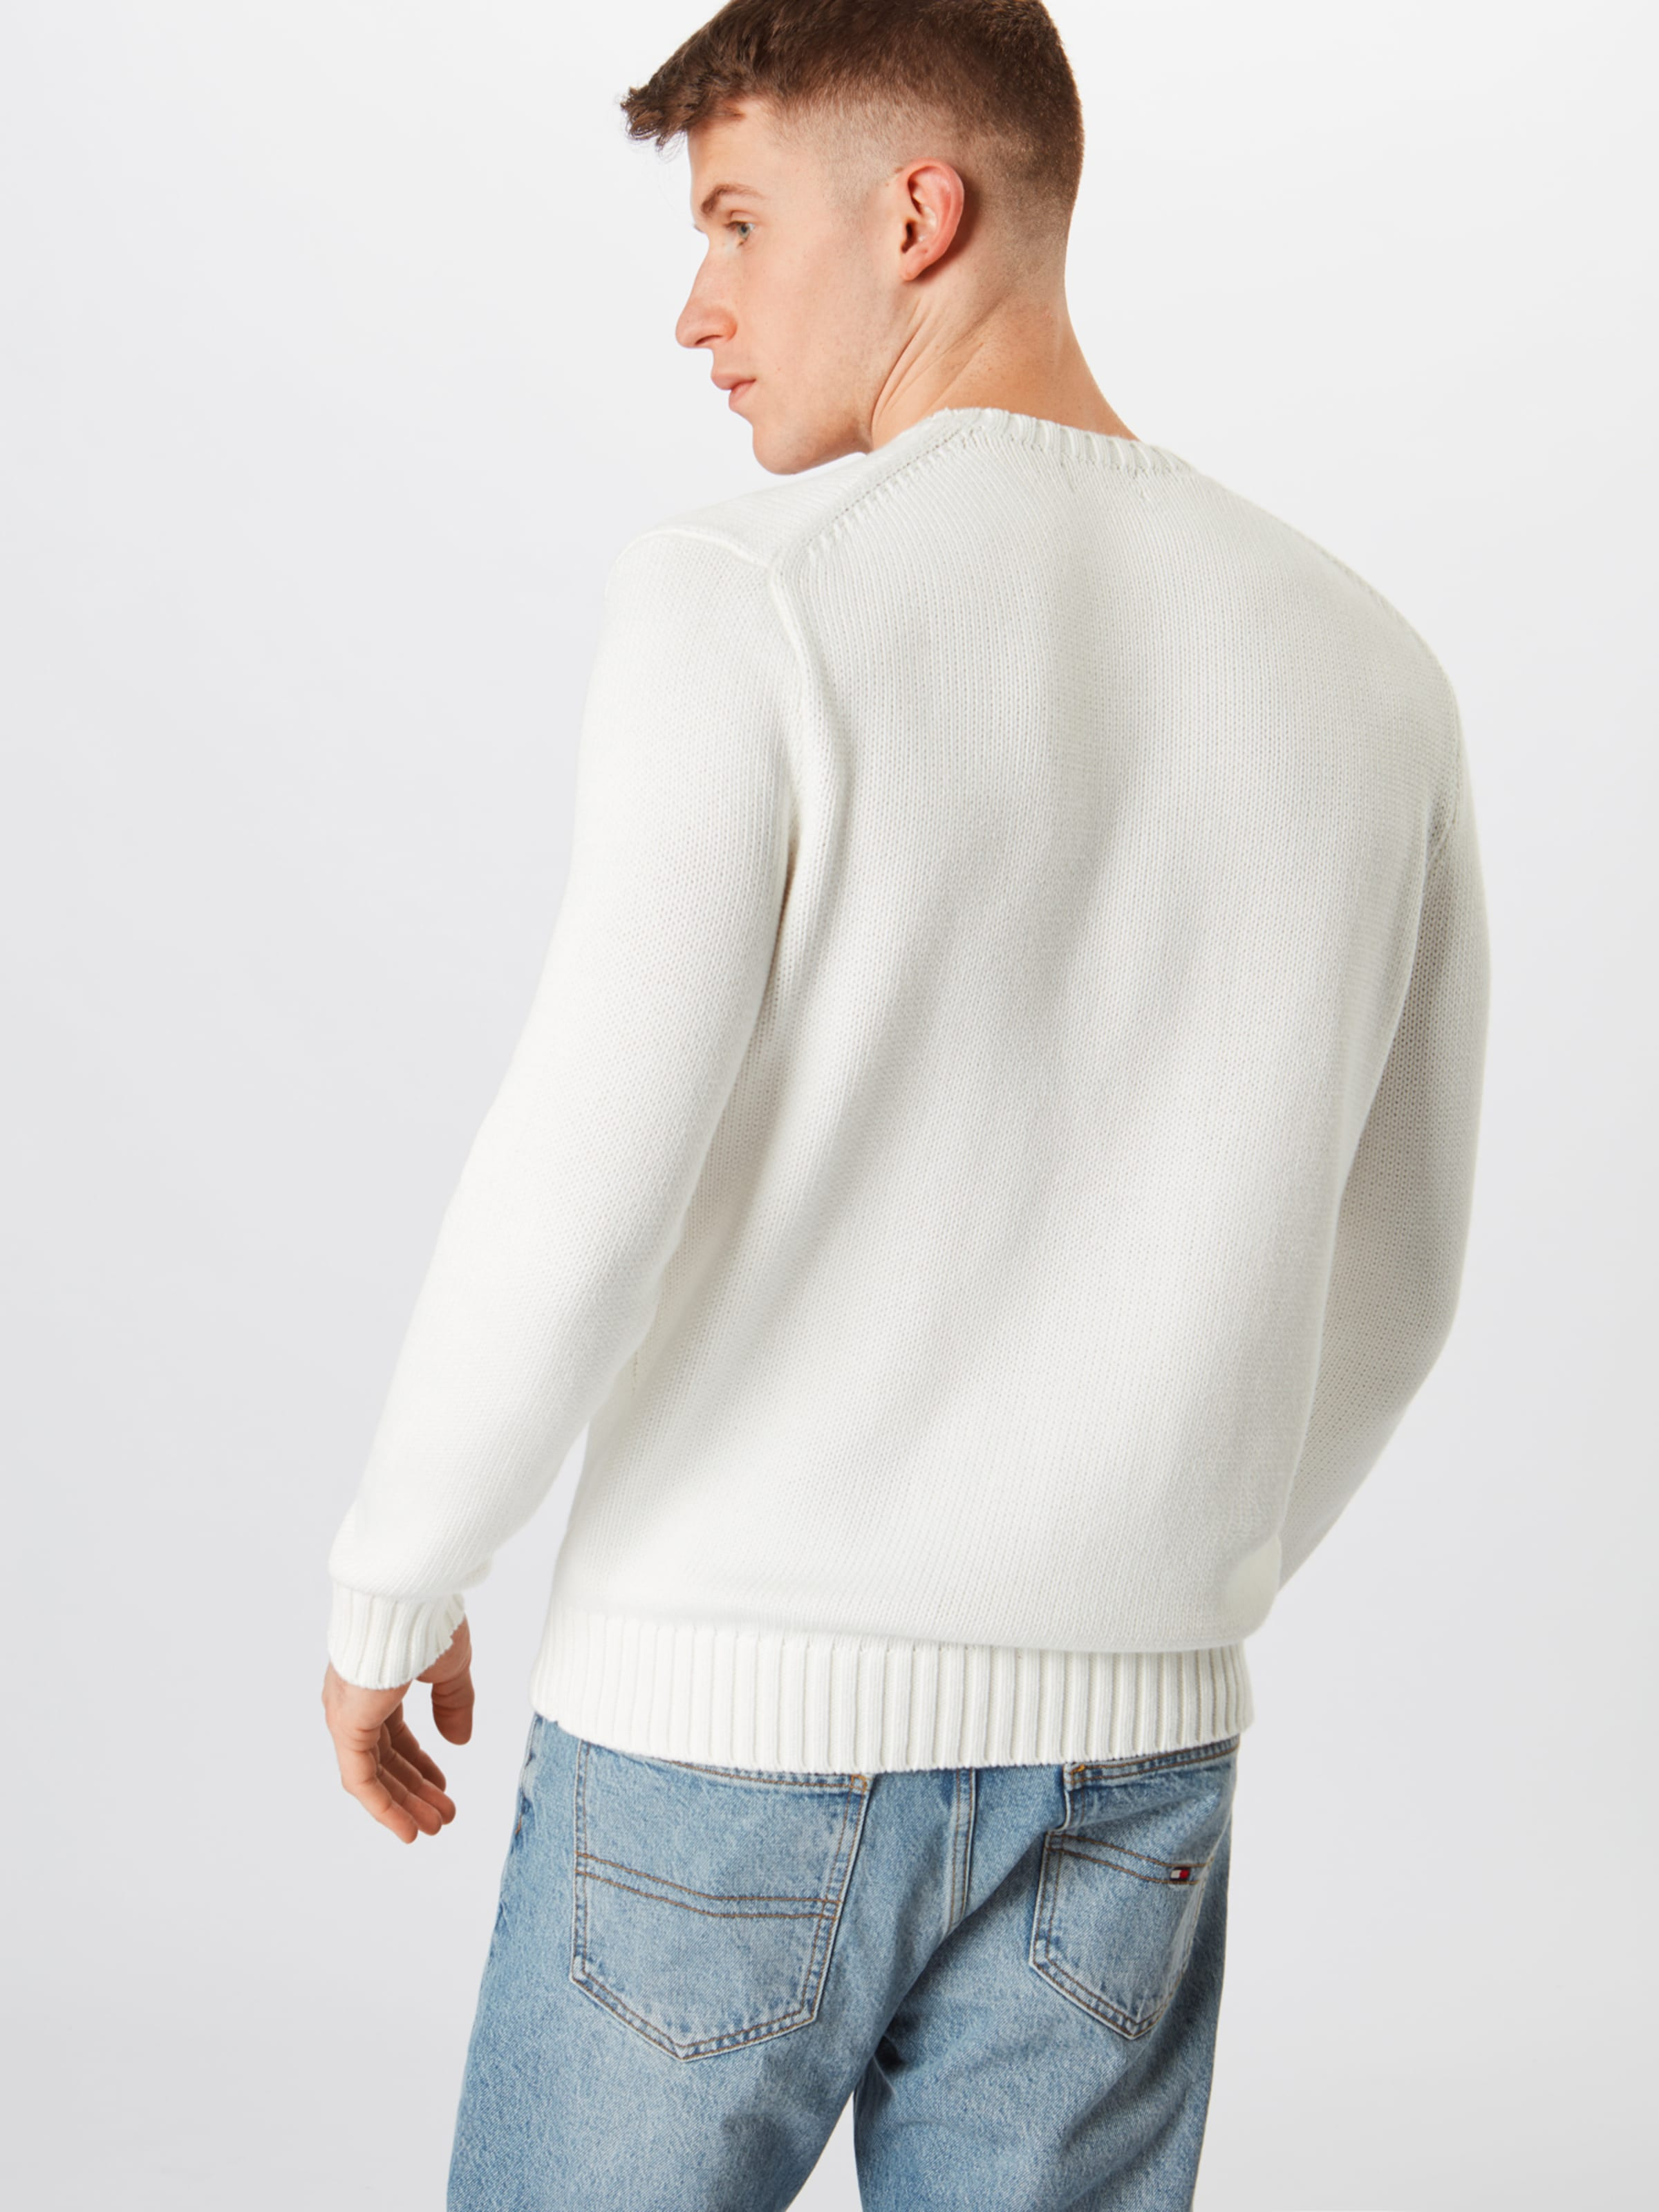 En long Cn Polo De Lauren over Ralph Pull 'logo Sleeve Vin Bleu MarineLie sweater' bf76mIYgyv